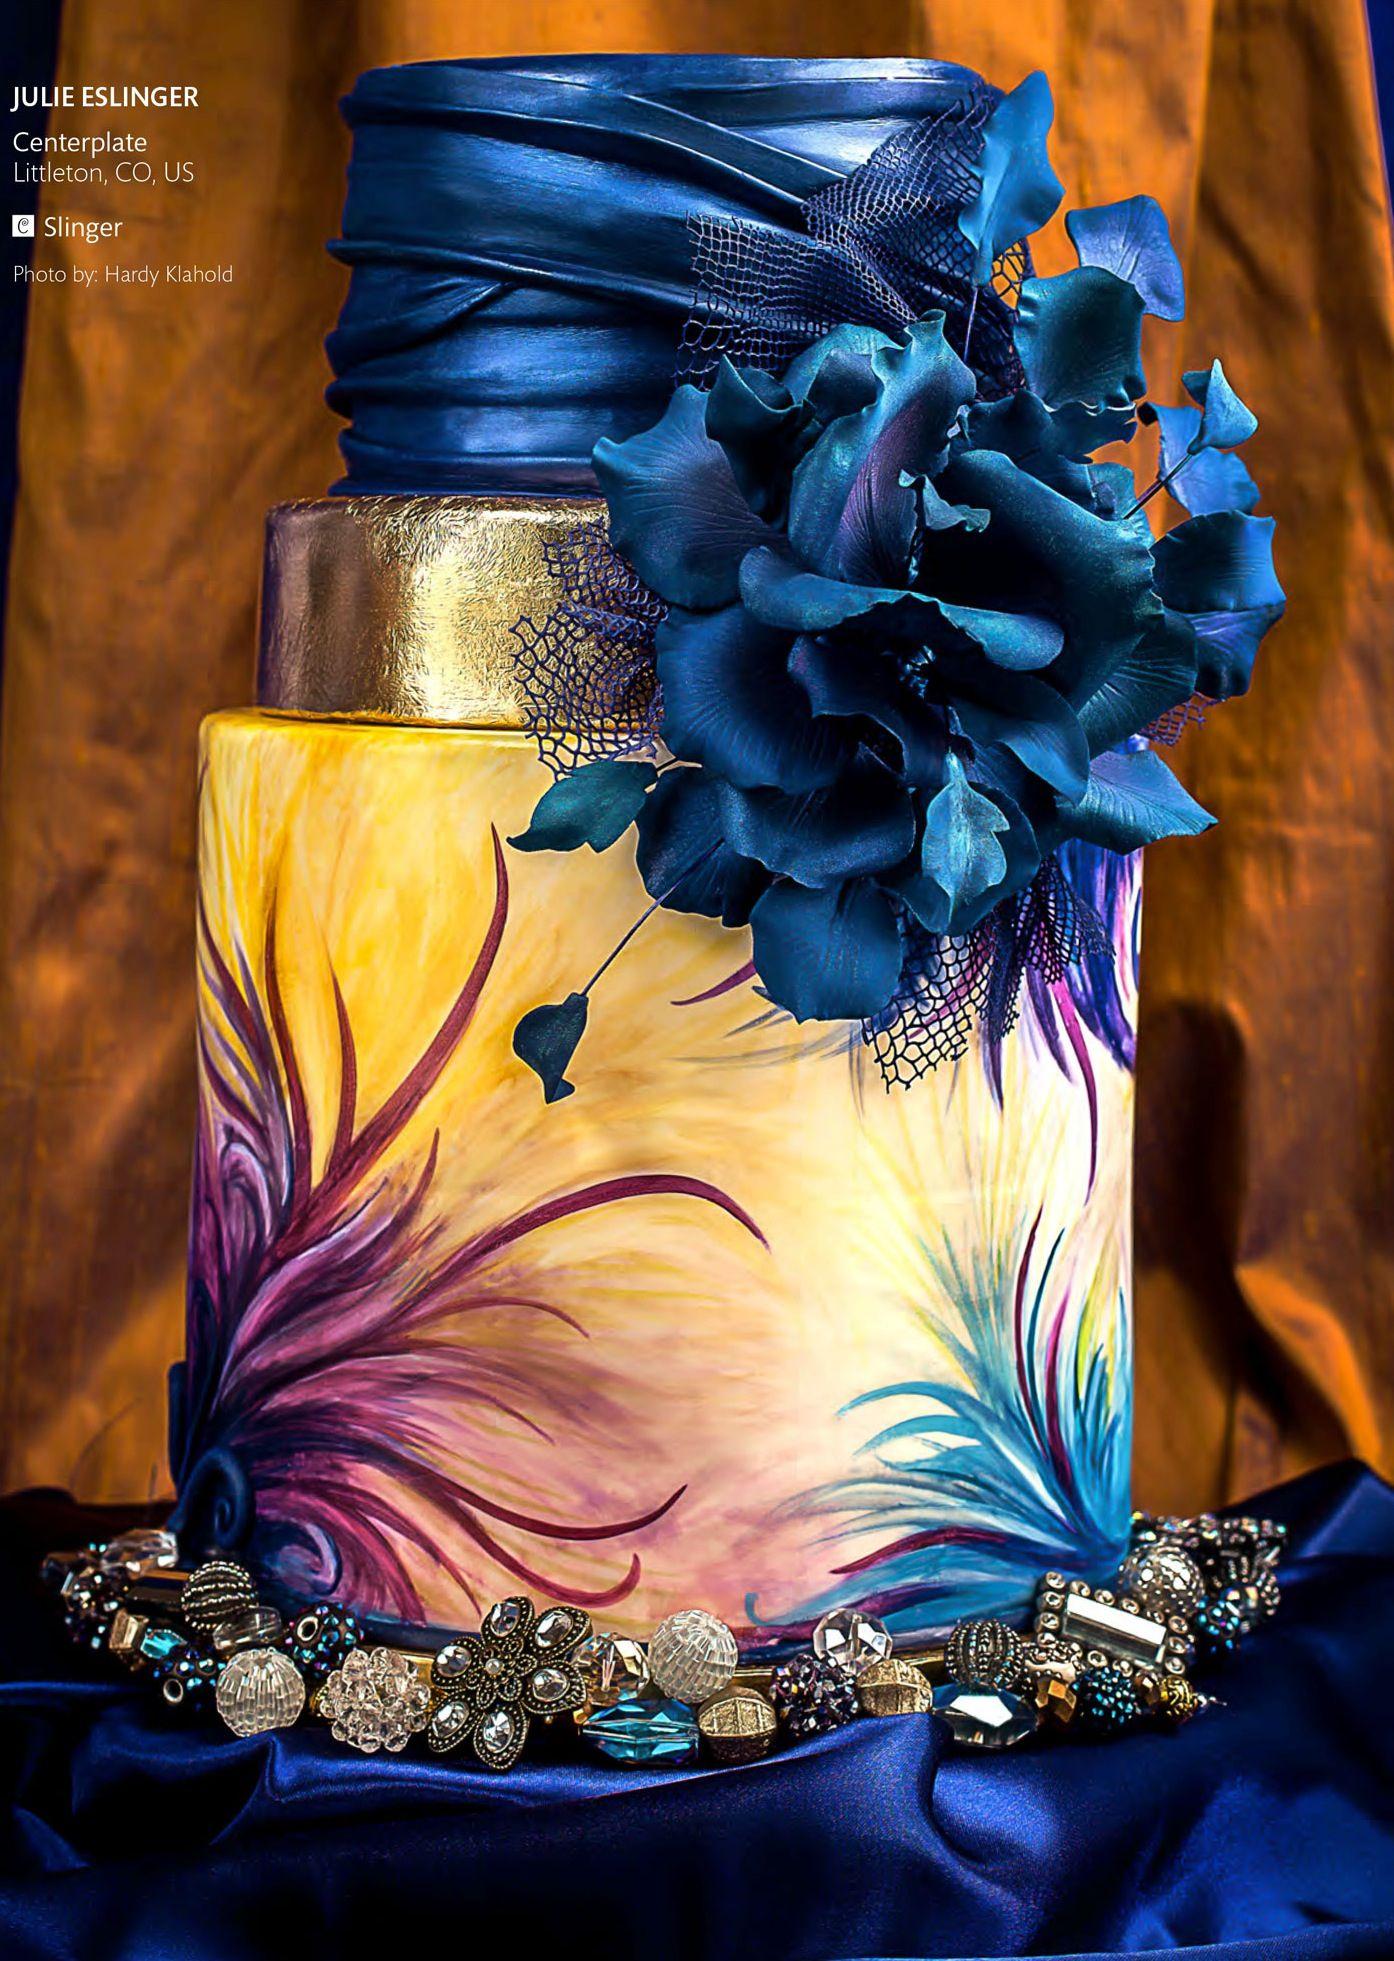 Pin by brittnee klinger on cakes pinterest purple cakes indian